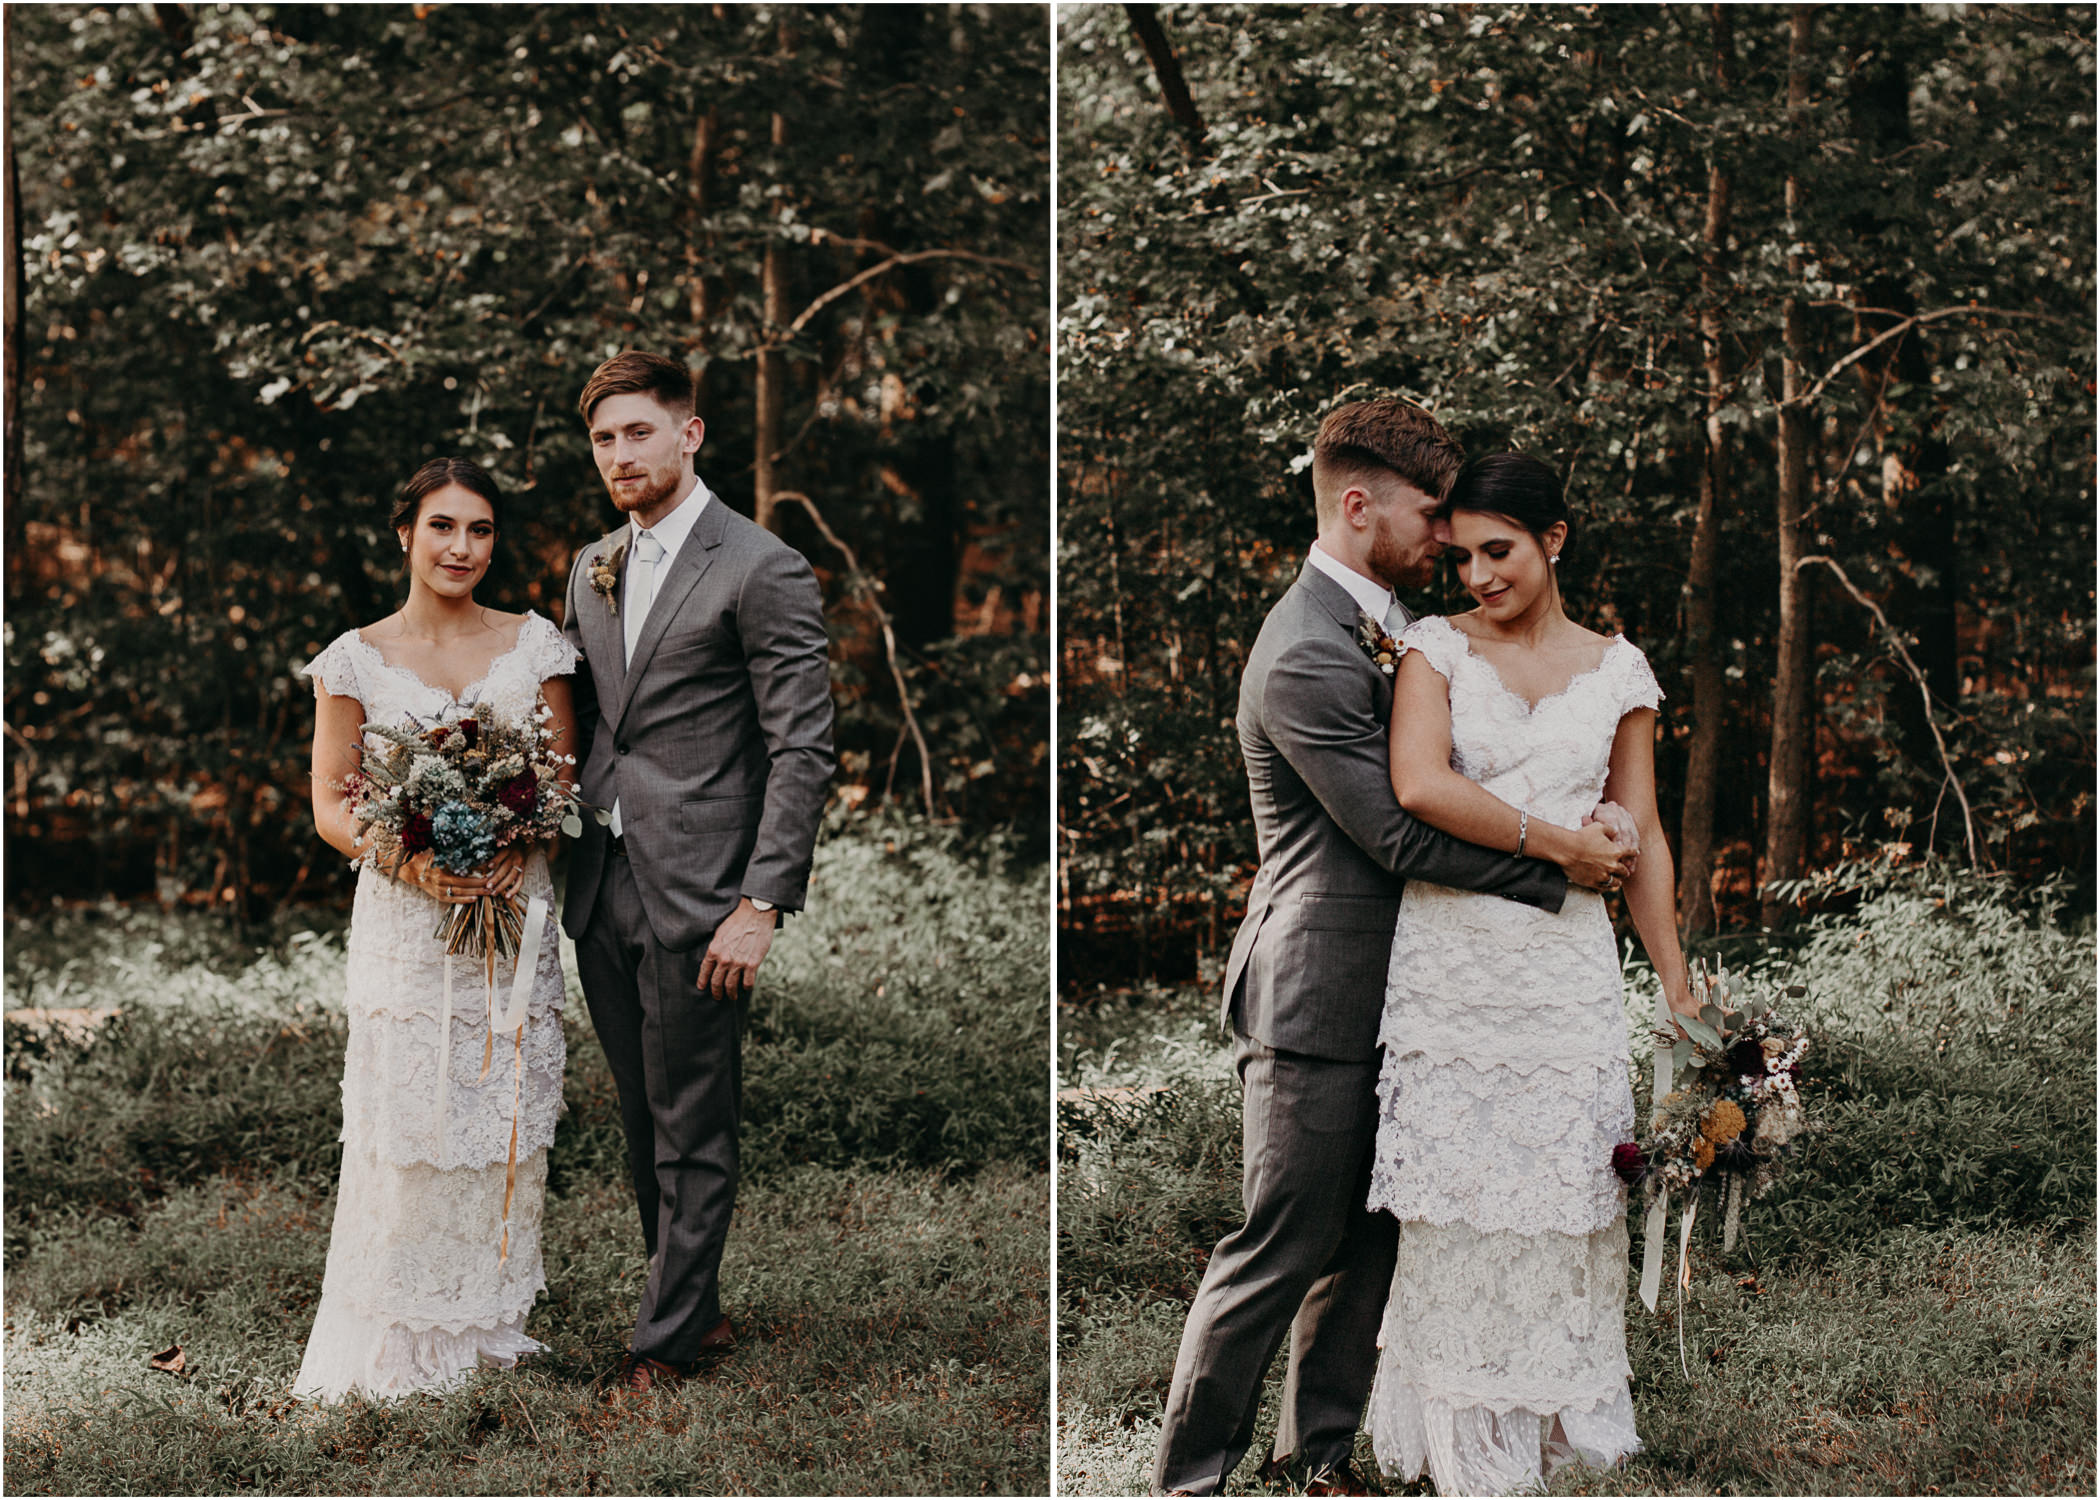 46 Bride & Groom first look before the ceremony on wedding day - Atlanta Wedding Photographer .jpg